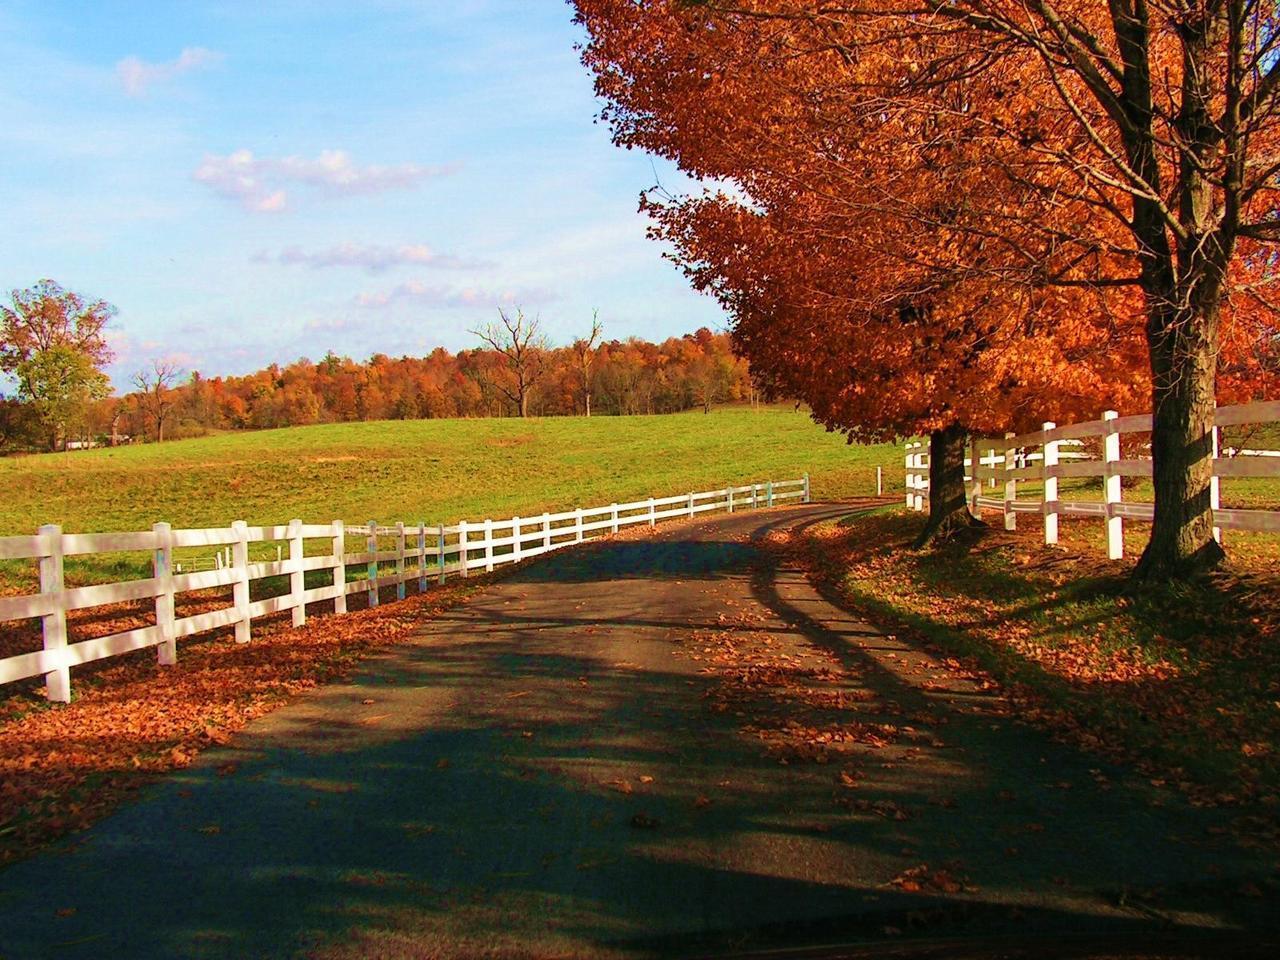 fall and autumn image